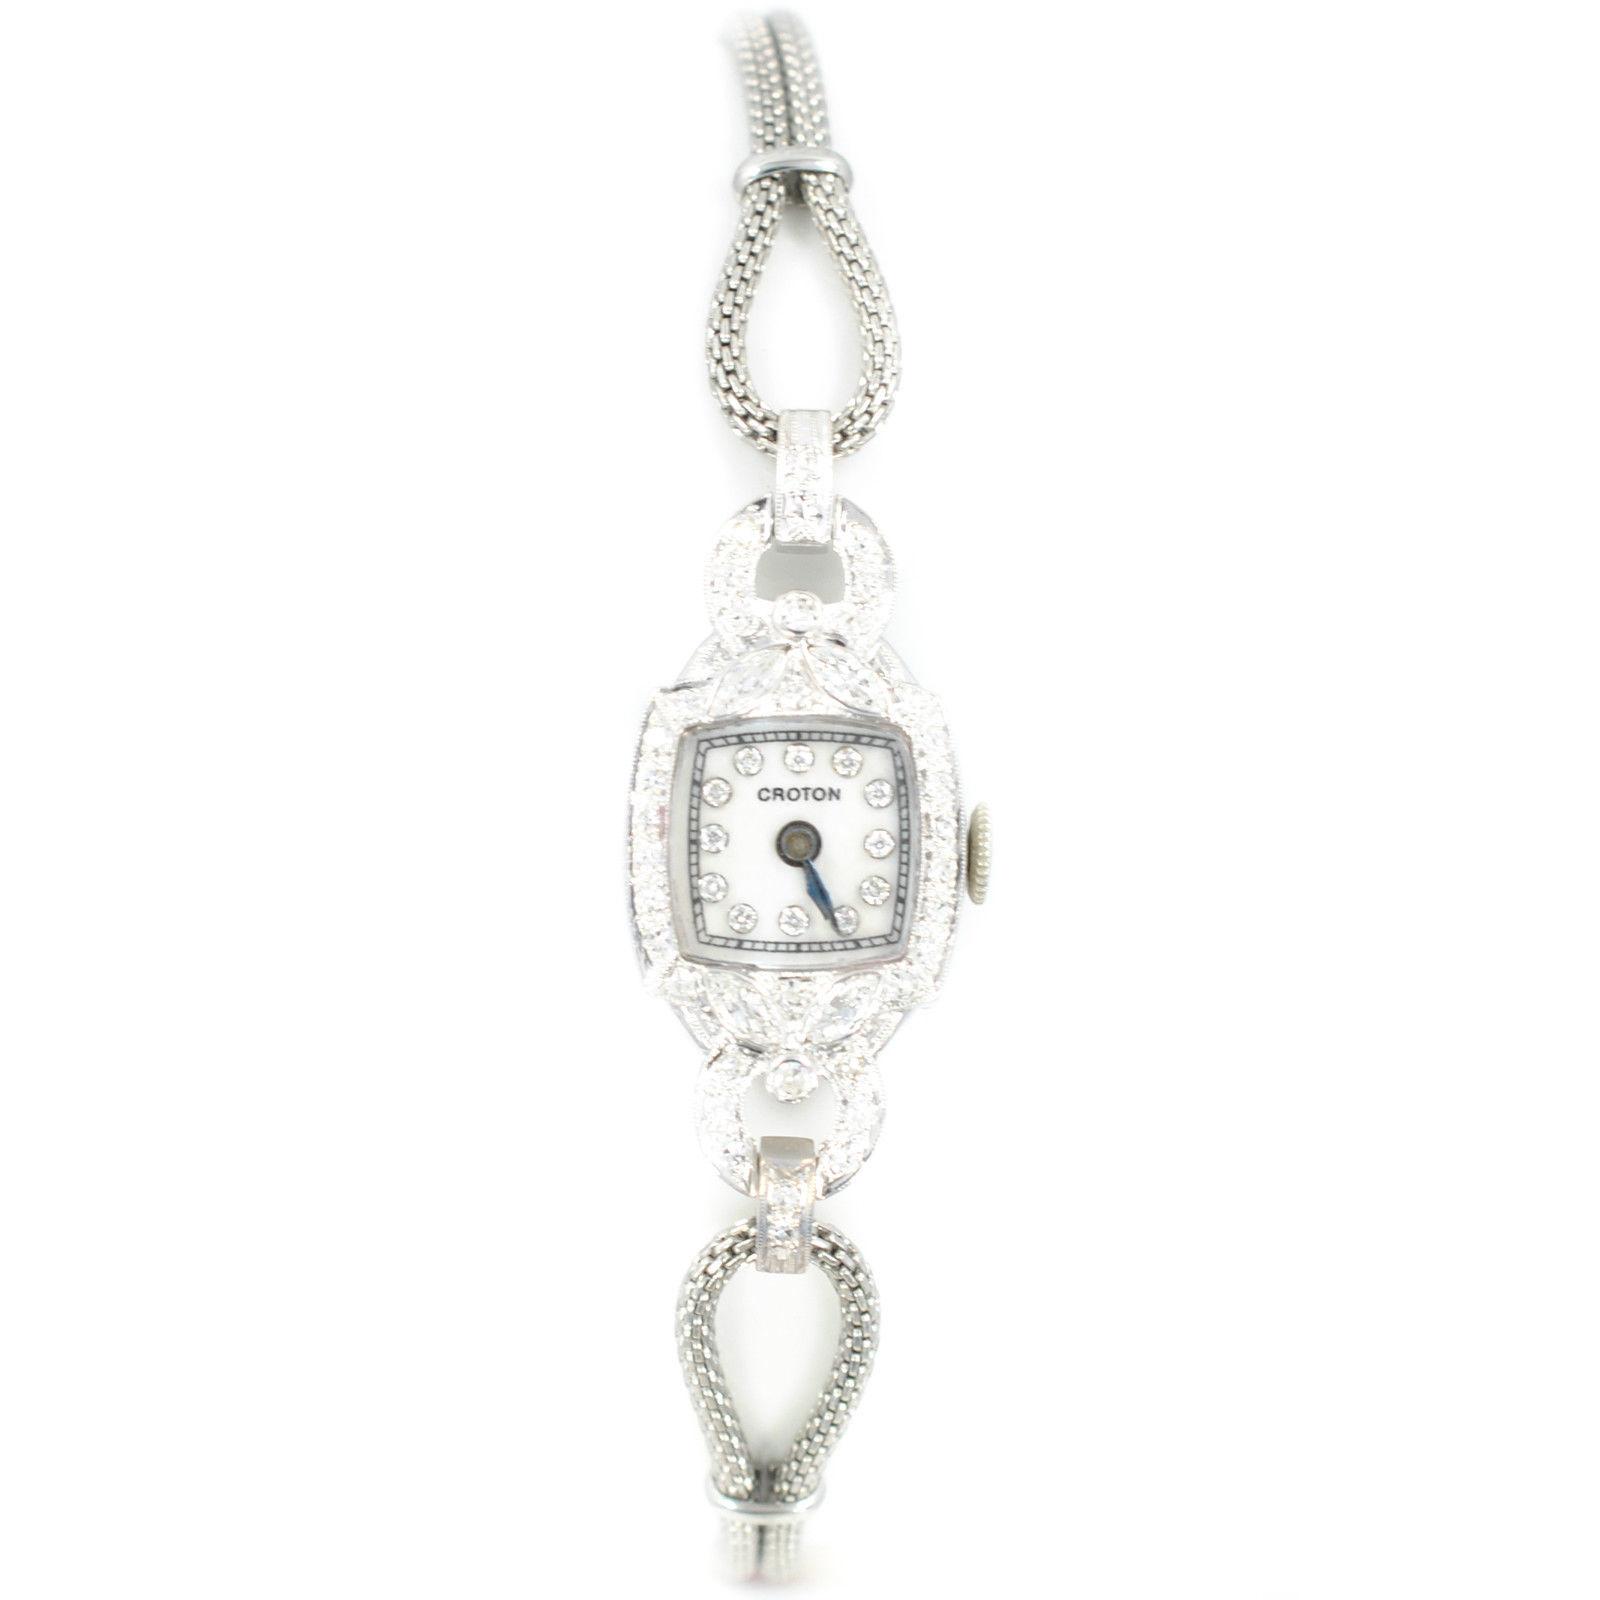 Croton Vintage Womens Manual Winding Watch Platinum & SS